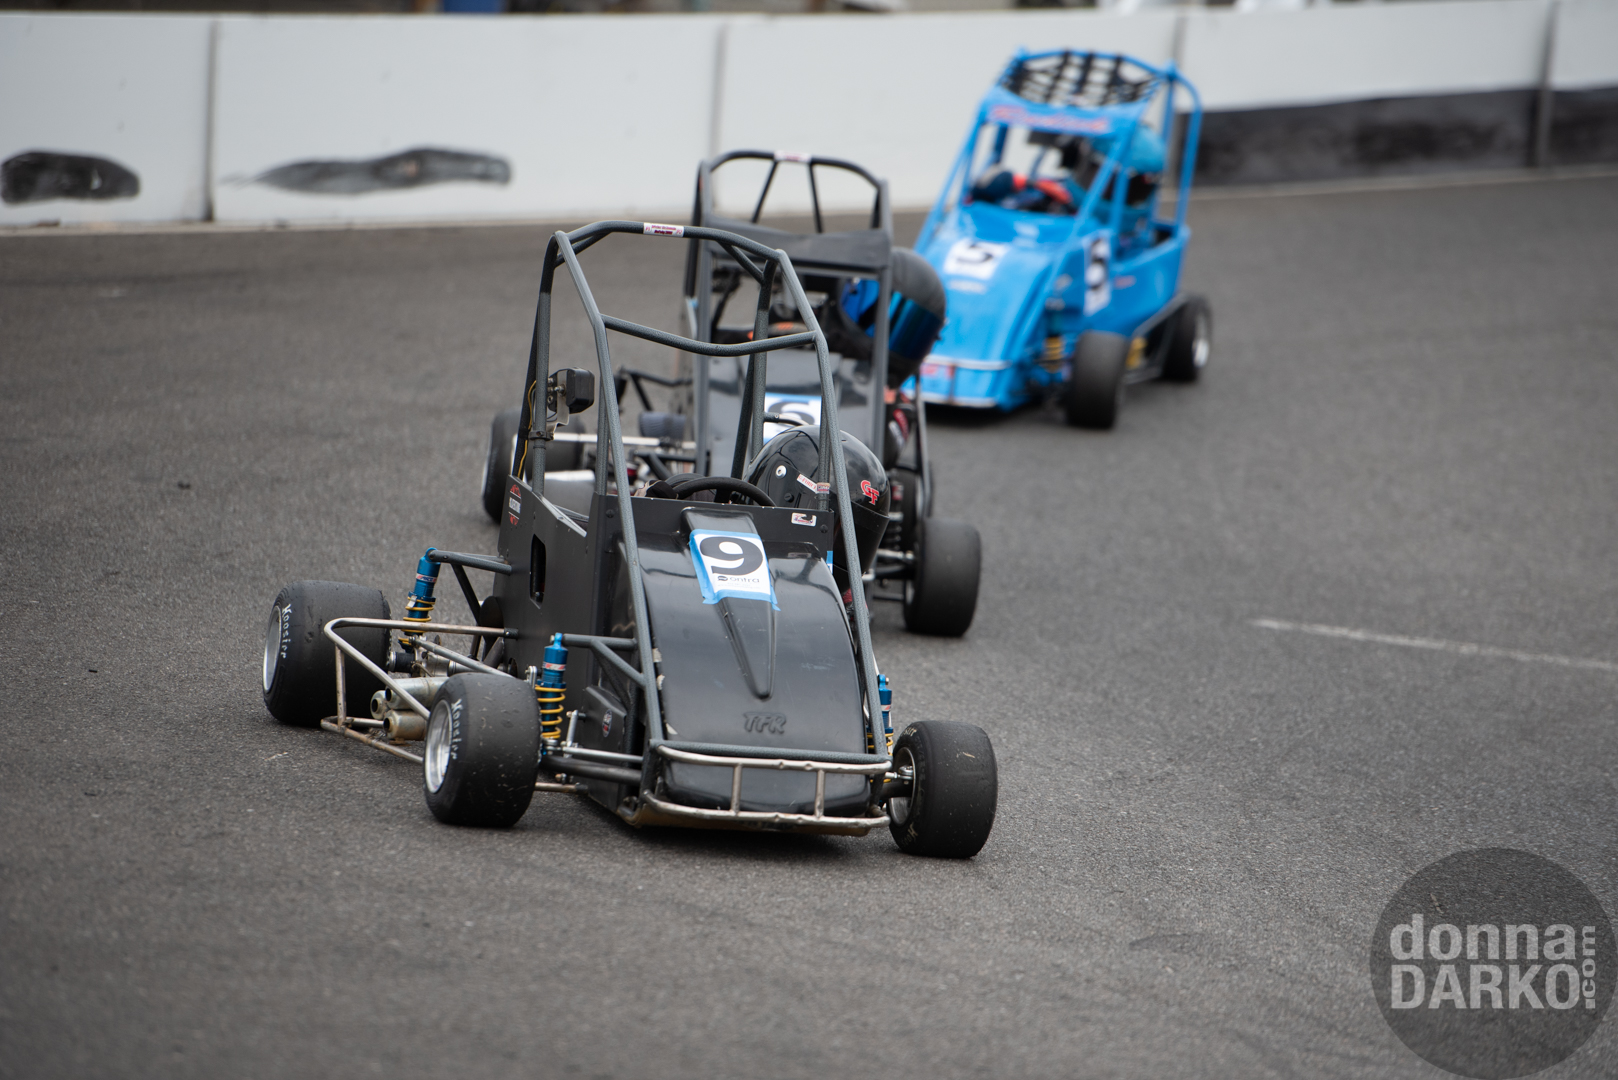 QWMA (Racing) 8-11-2019 DSC_7224.jpg